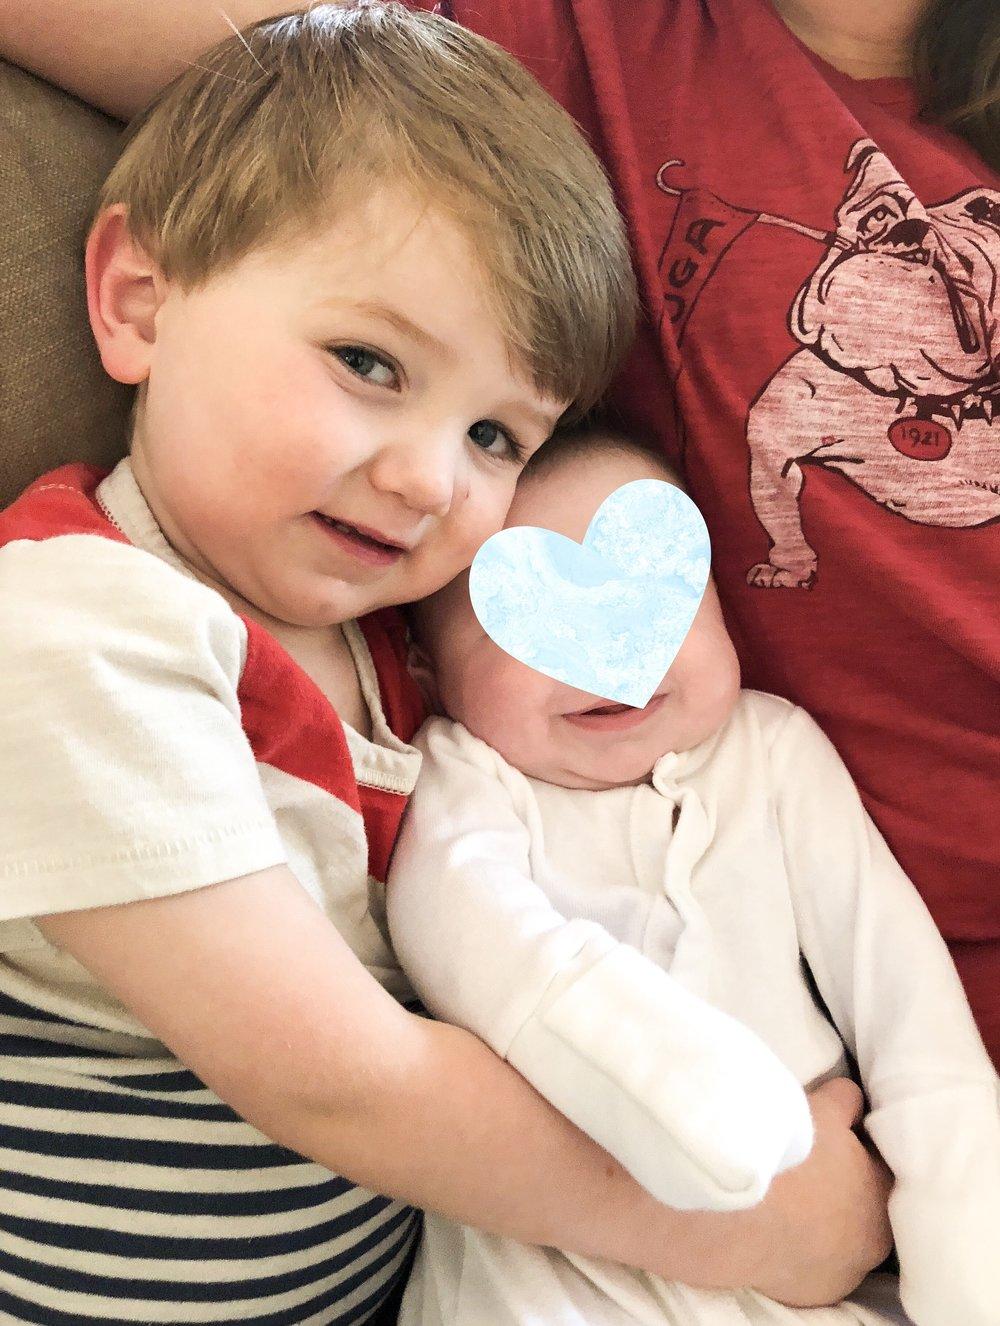 momstrosity-foster-care-siblings.JPG